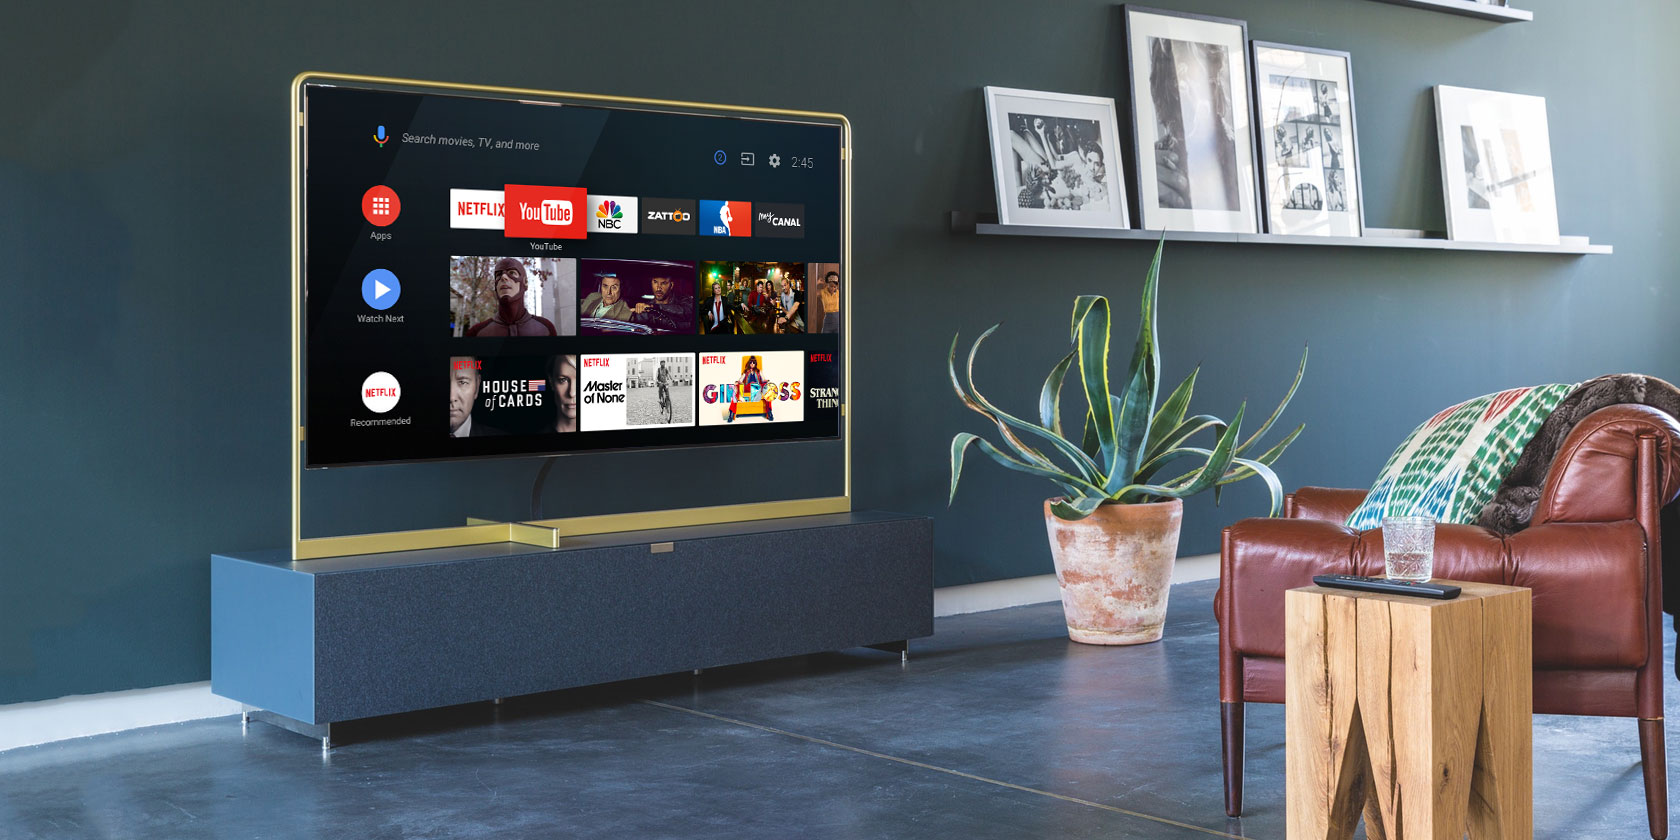 Android TV Versus Google Chrome Cast Side Loading